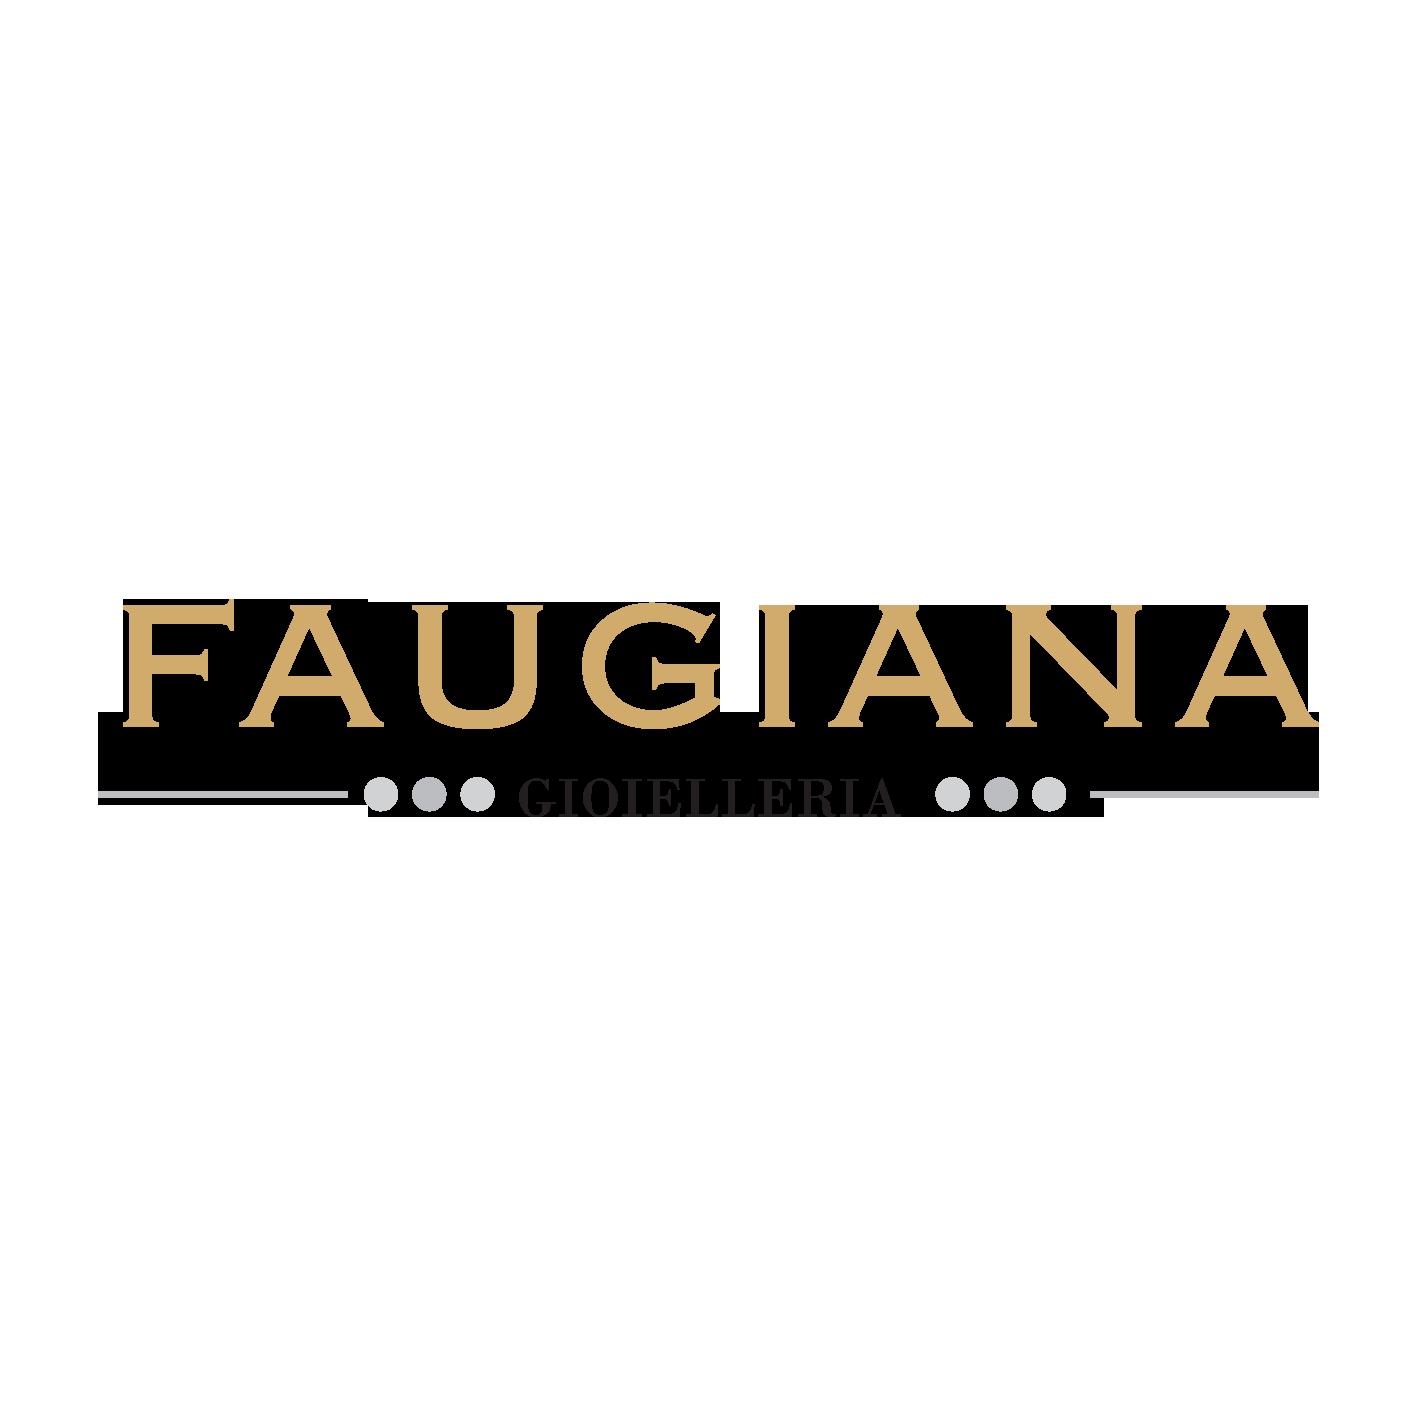 Gioielleria Faugiana